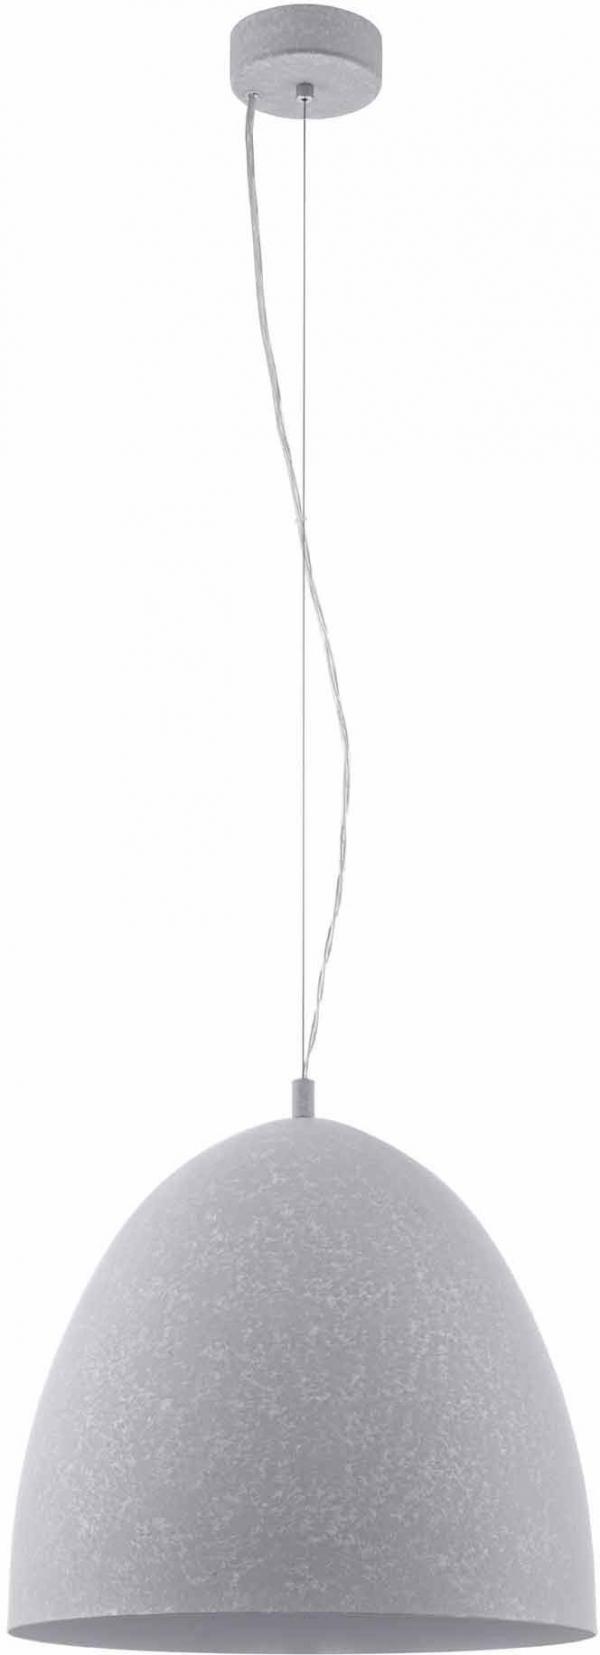 Pendelleuchte-SARABIA-ø40,5cm-main